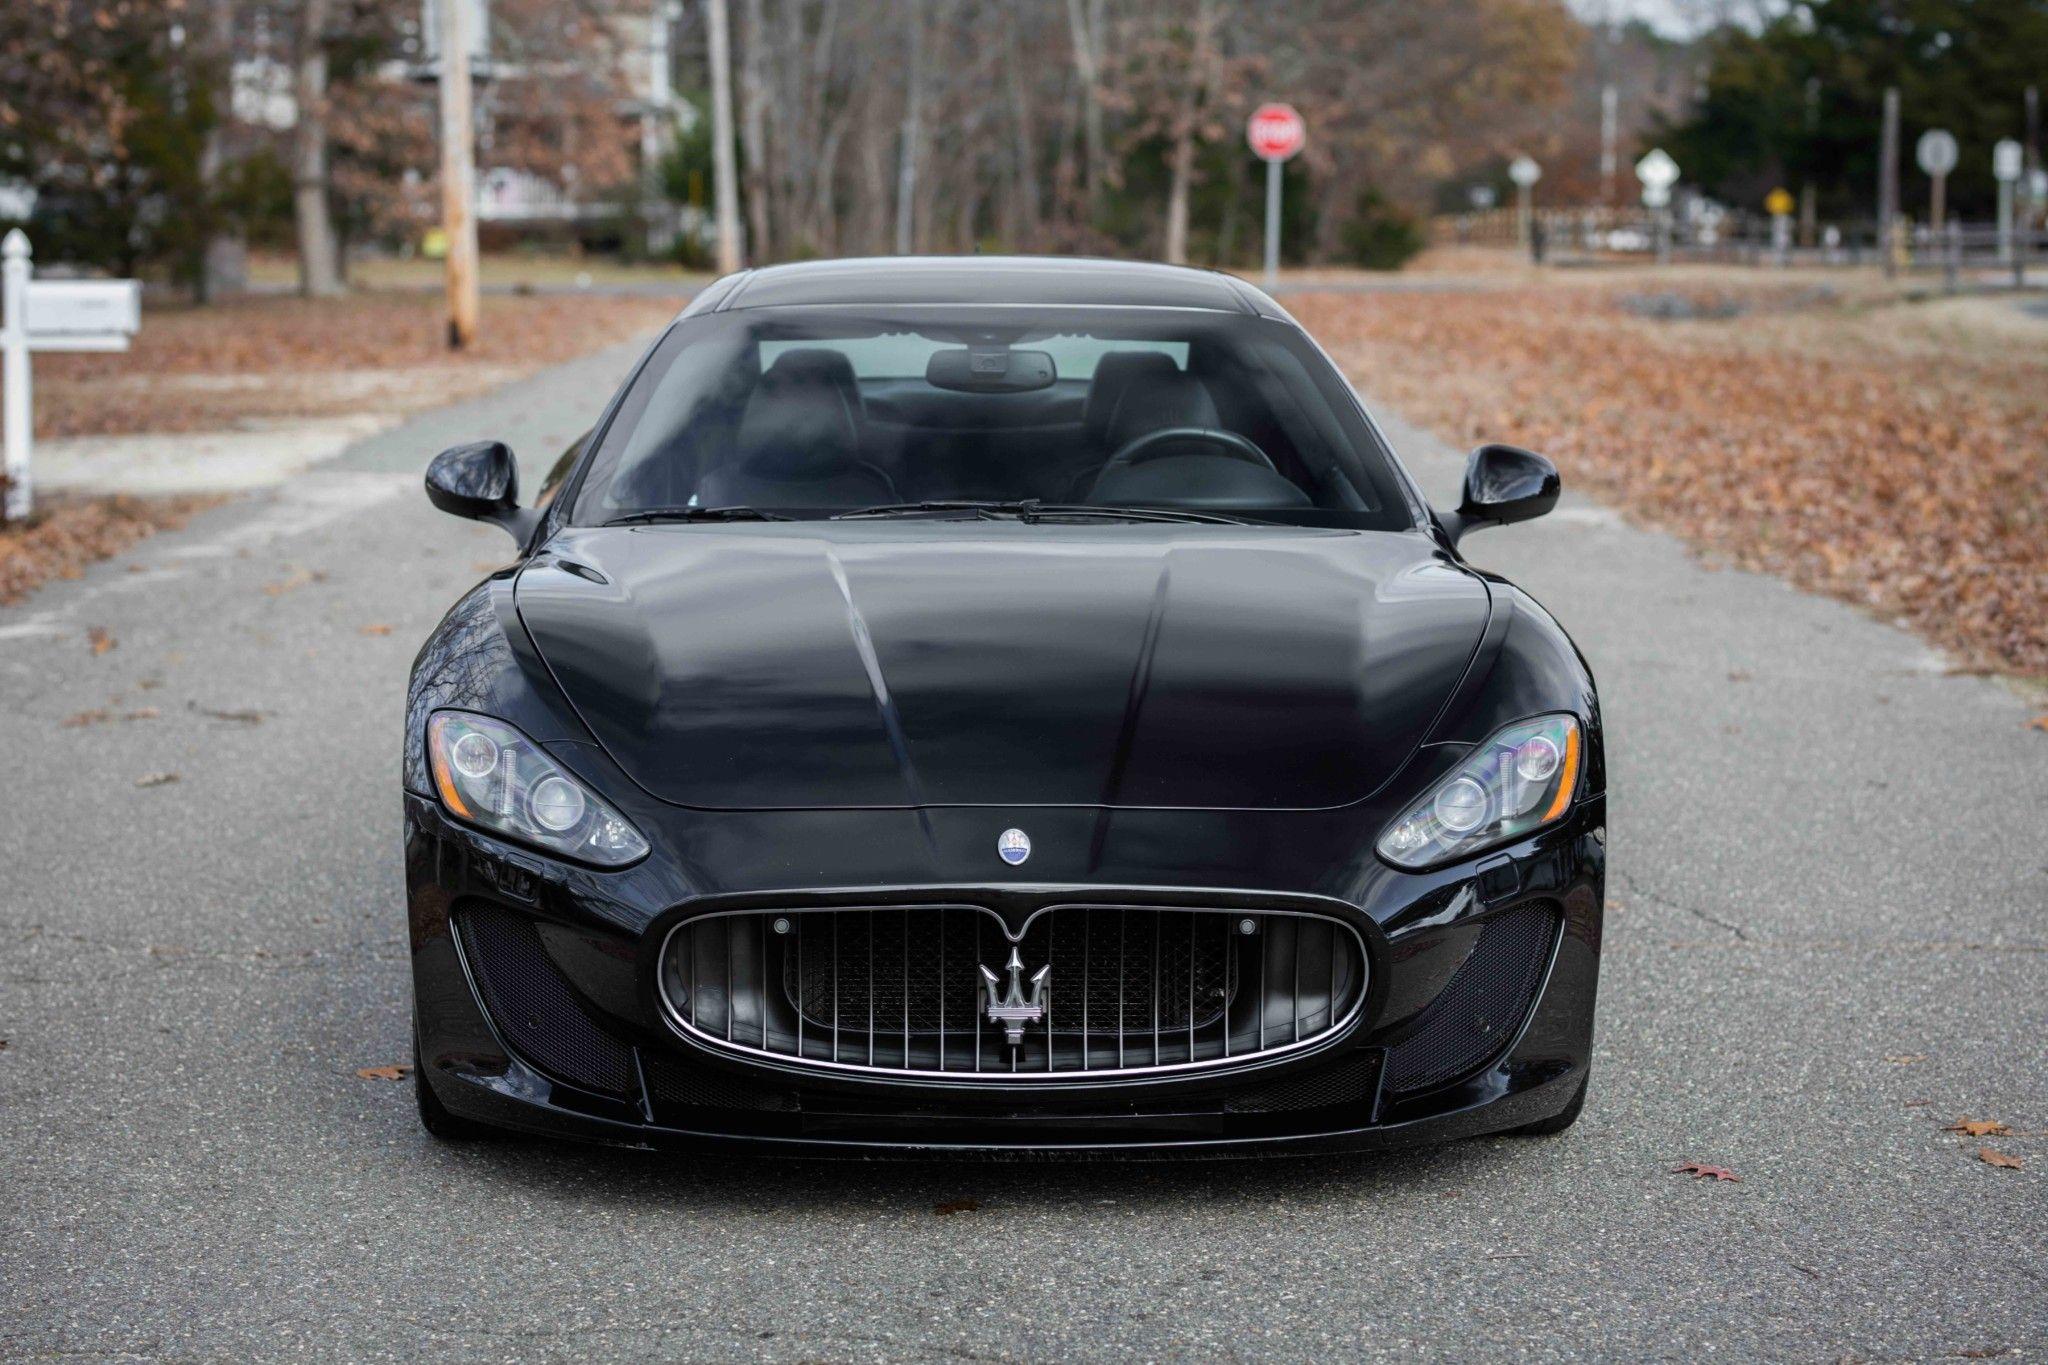 2009 Maserati GranTurismo S   Maserati granturismo s ...